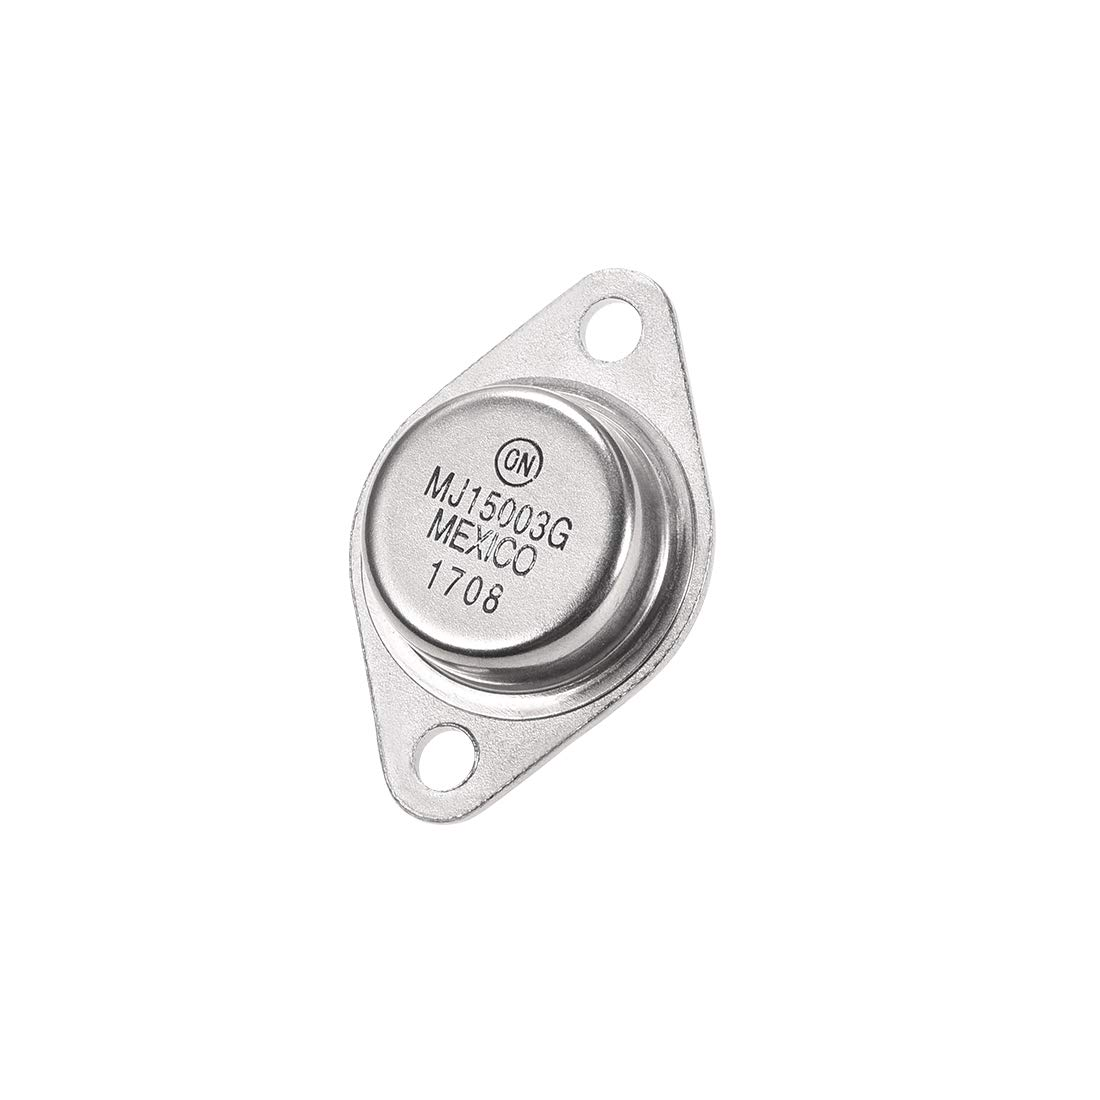 5A 60V 50W Bipolar uxcell 2pcs 3DD207 to-3 NPN Power Transistors Single Transistor BJT